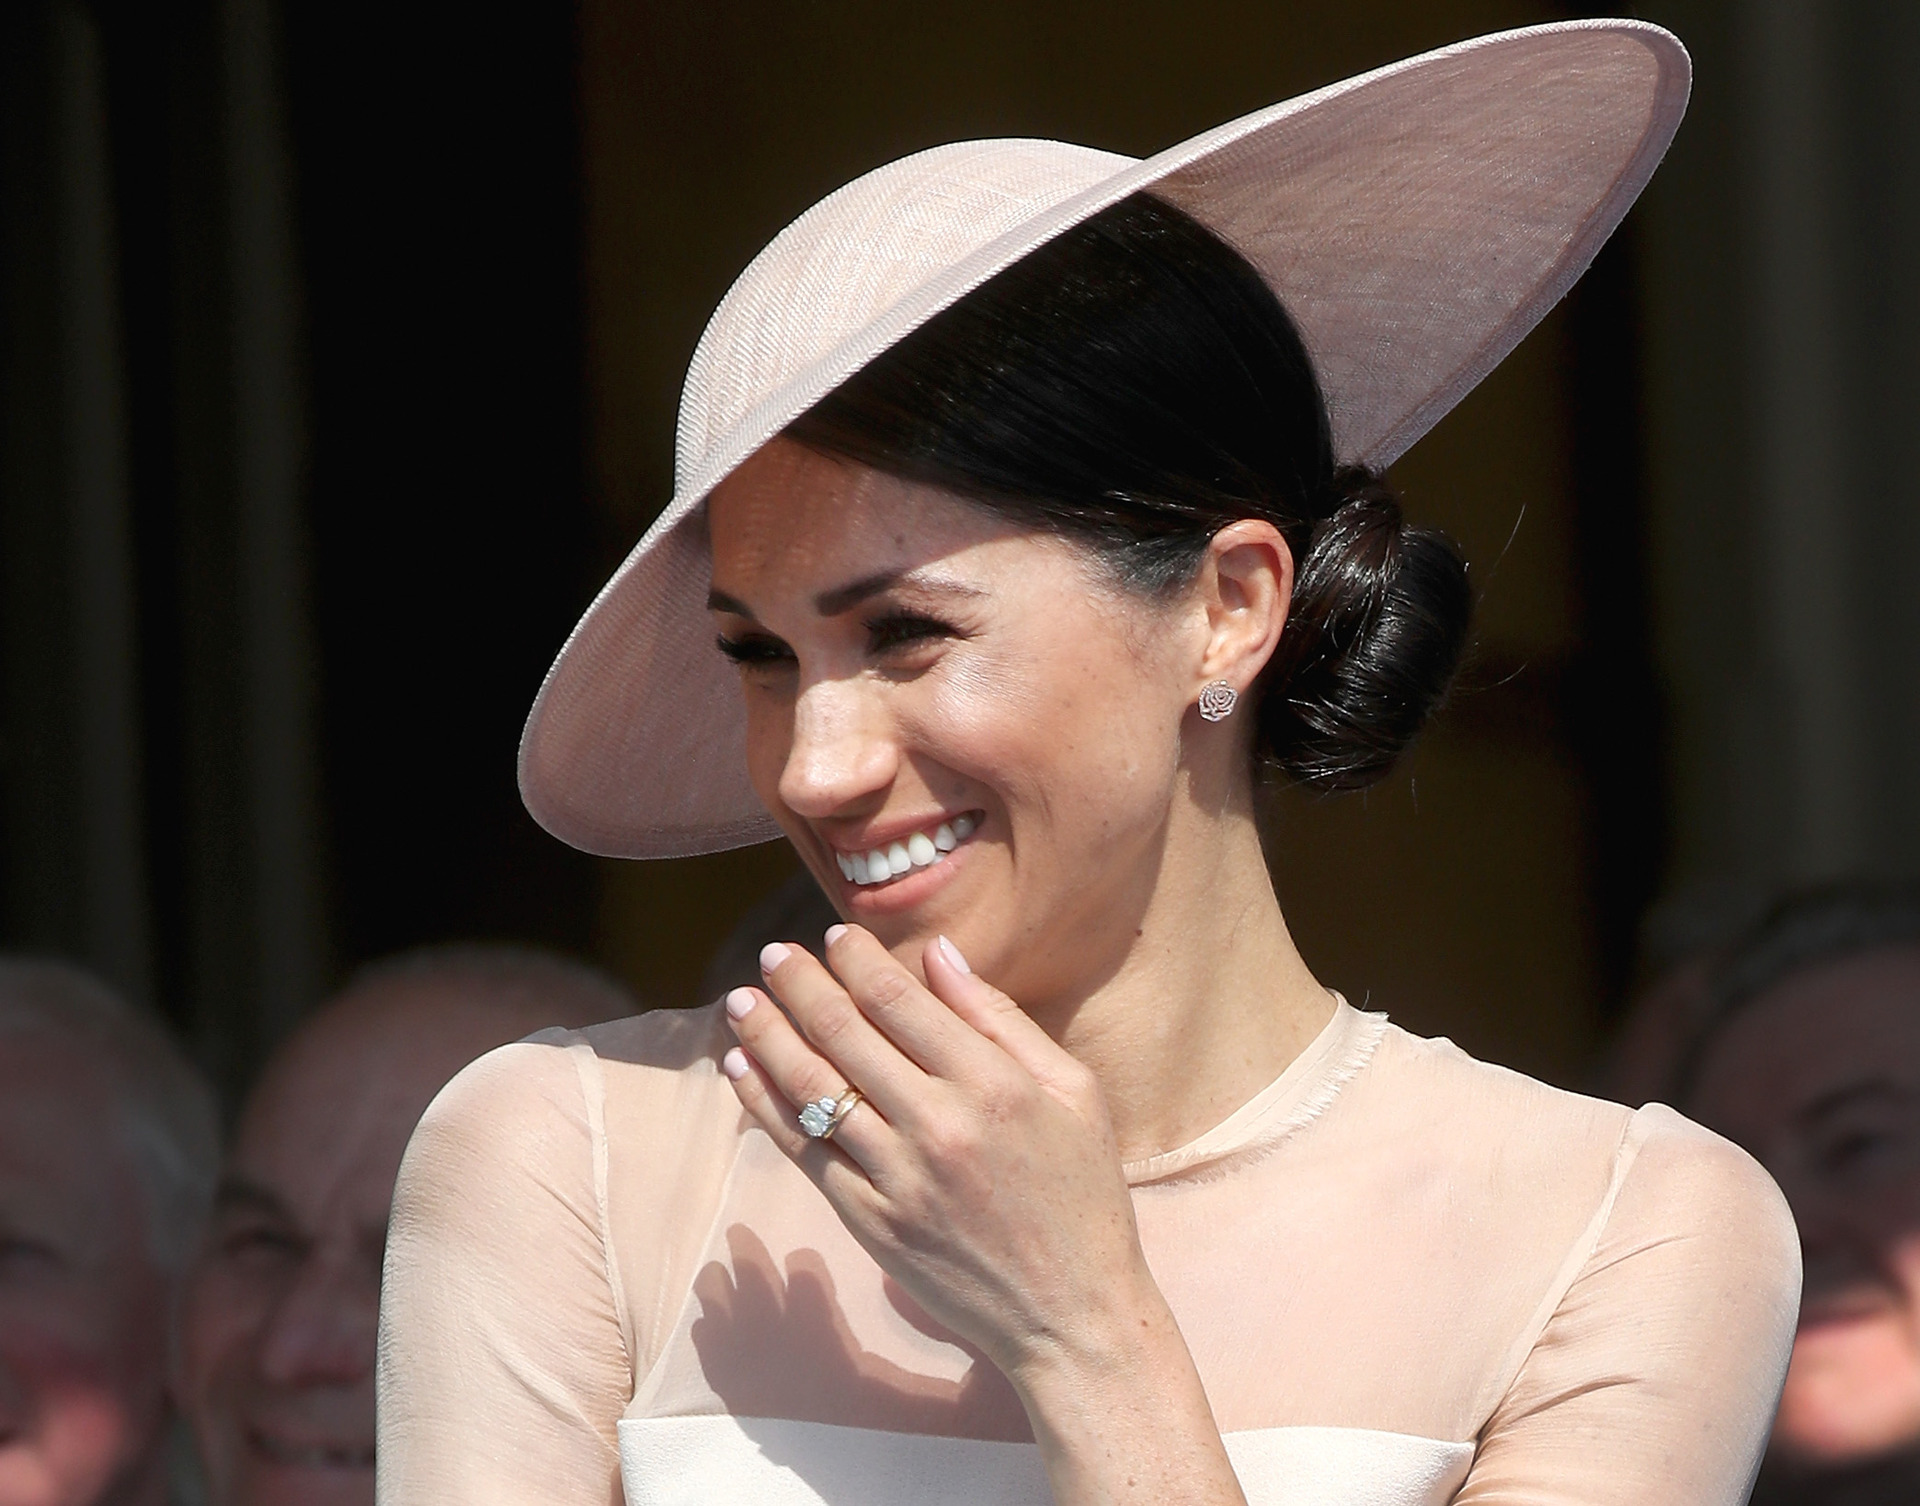 Royal expert: Meghan needs to stop spending 'huge quantities of money'